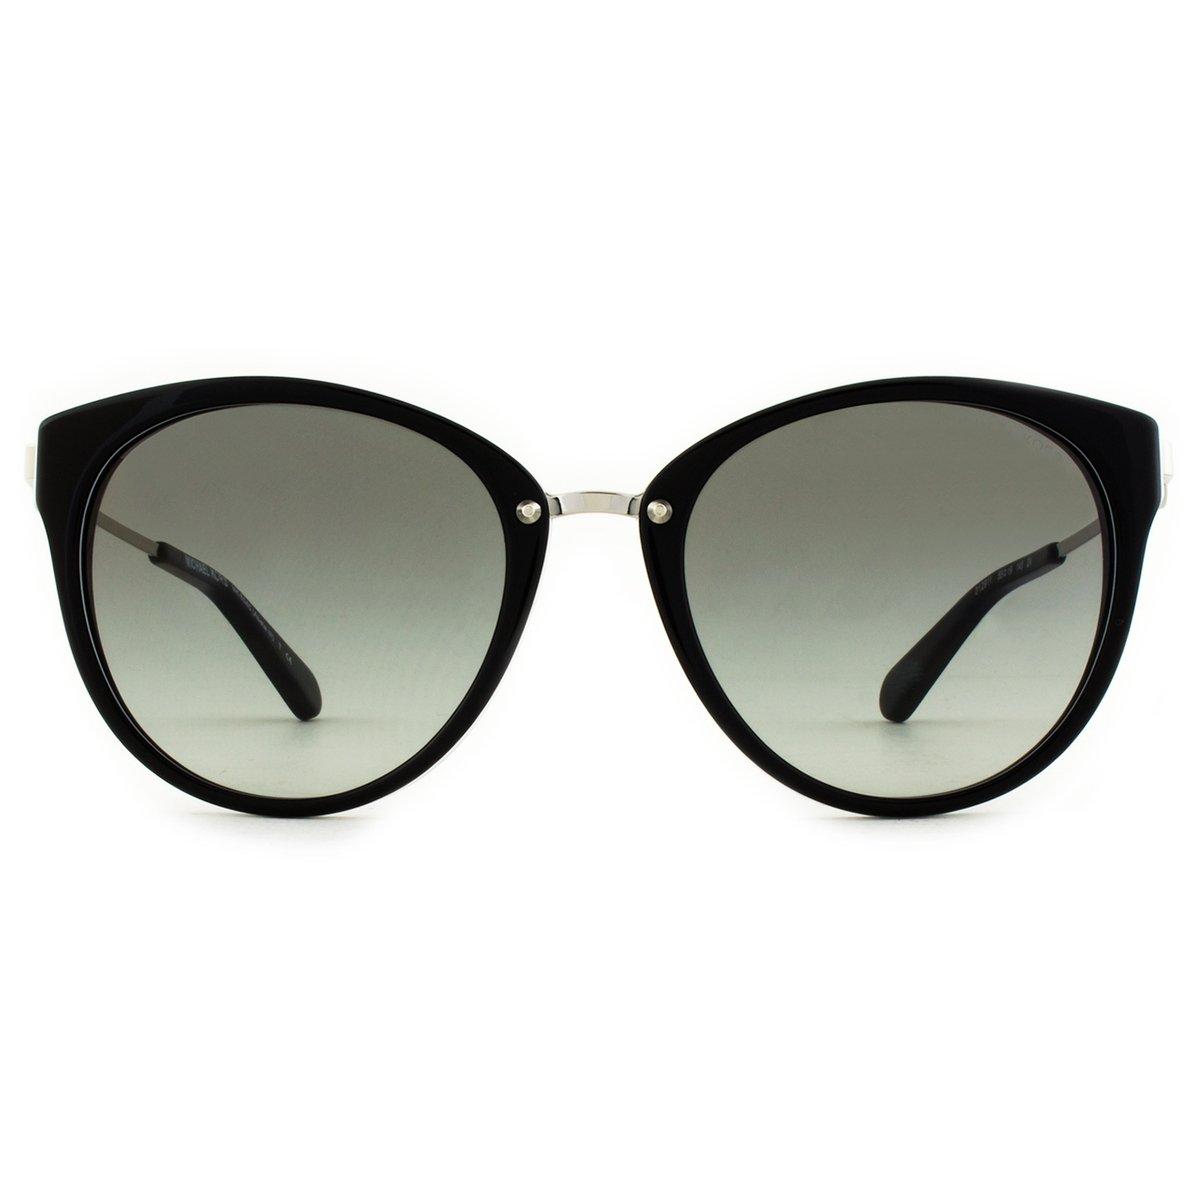 e6c5bd08feccb Óculos de Sol Michael Kors Abela III MK6040 312911-55 Feminino - Compre  Agora   Netshoes